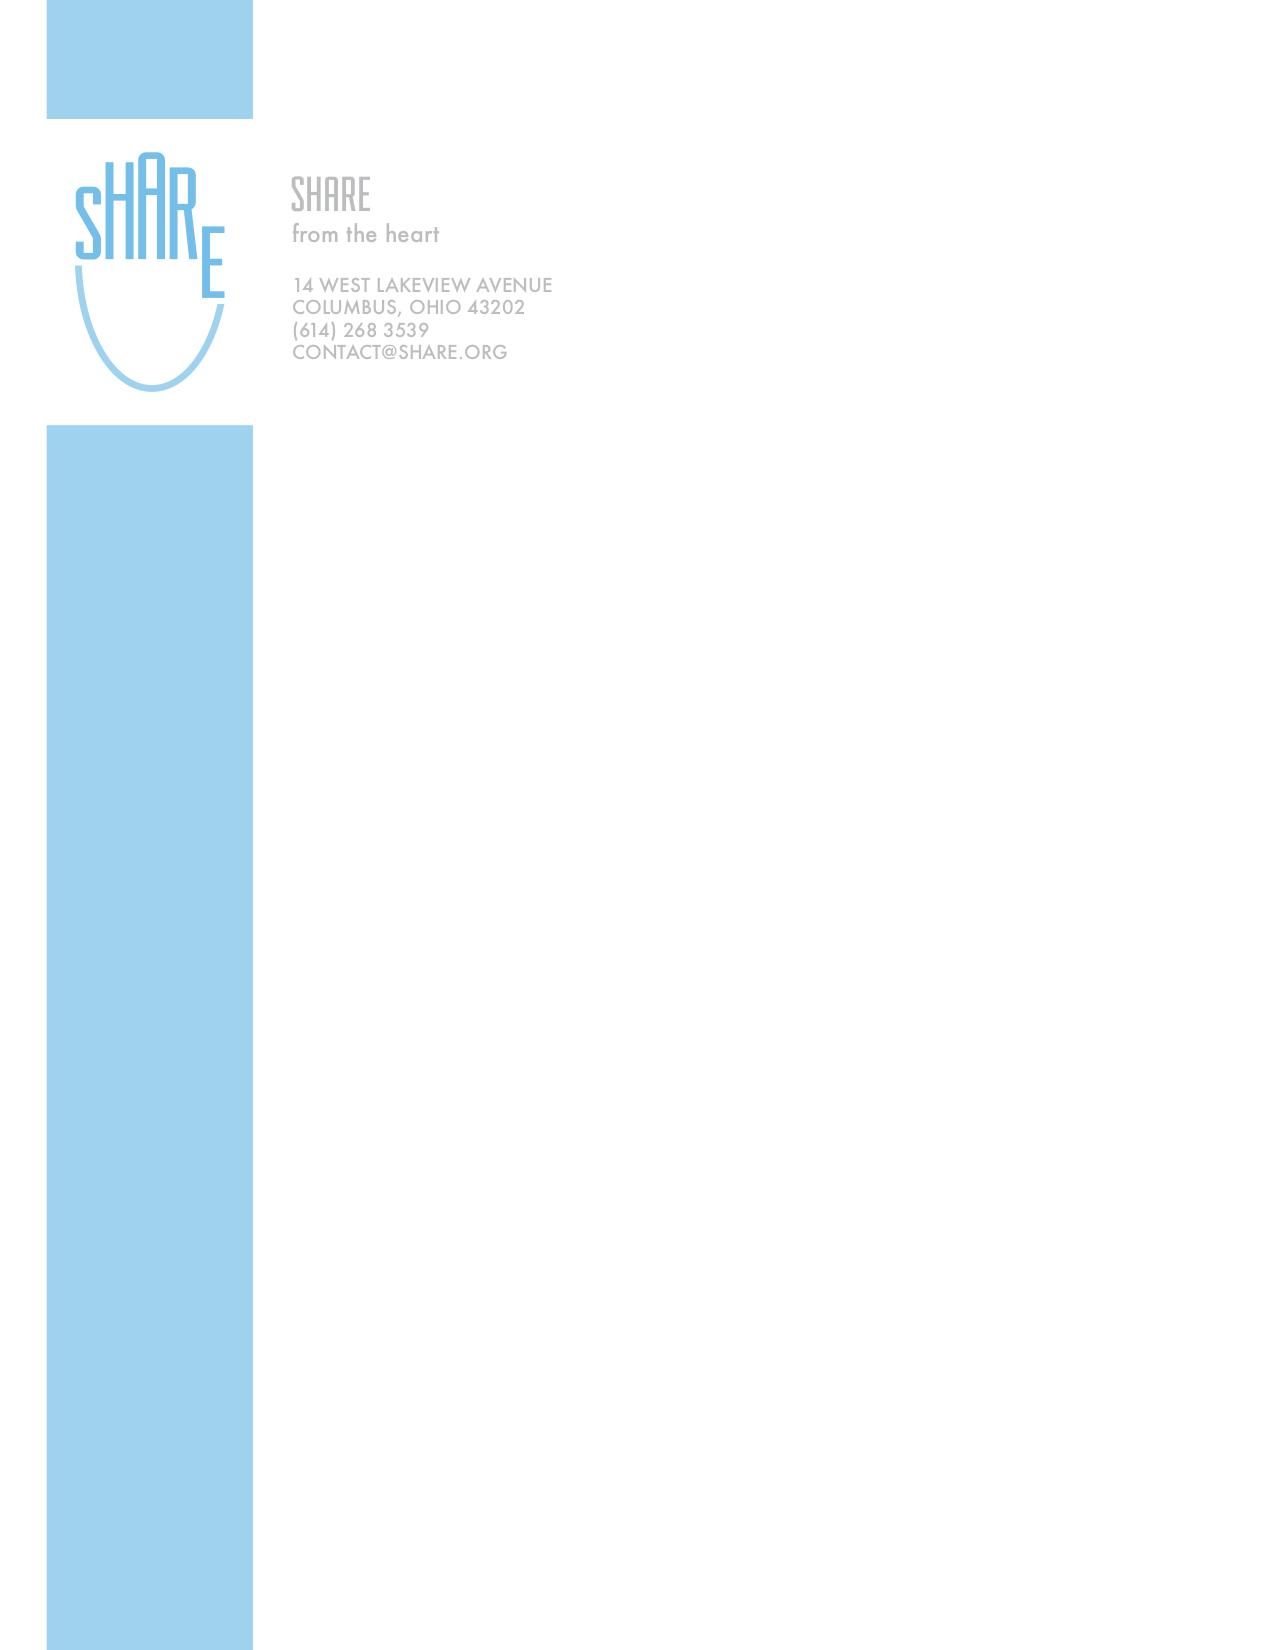 School-Share-Letterhead.jpg